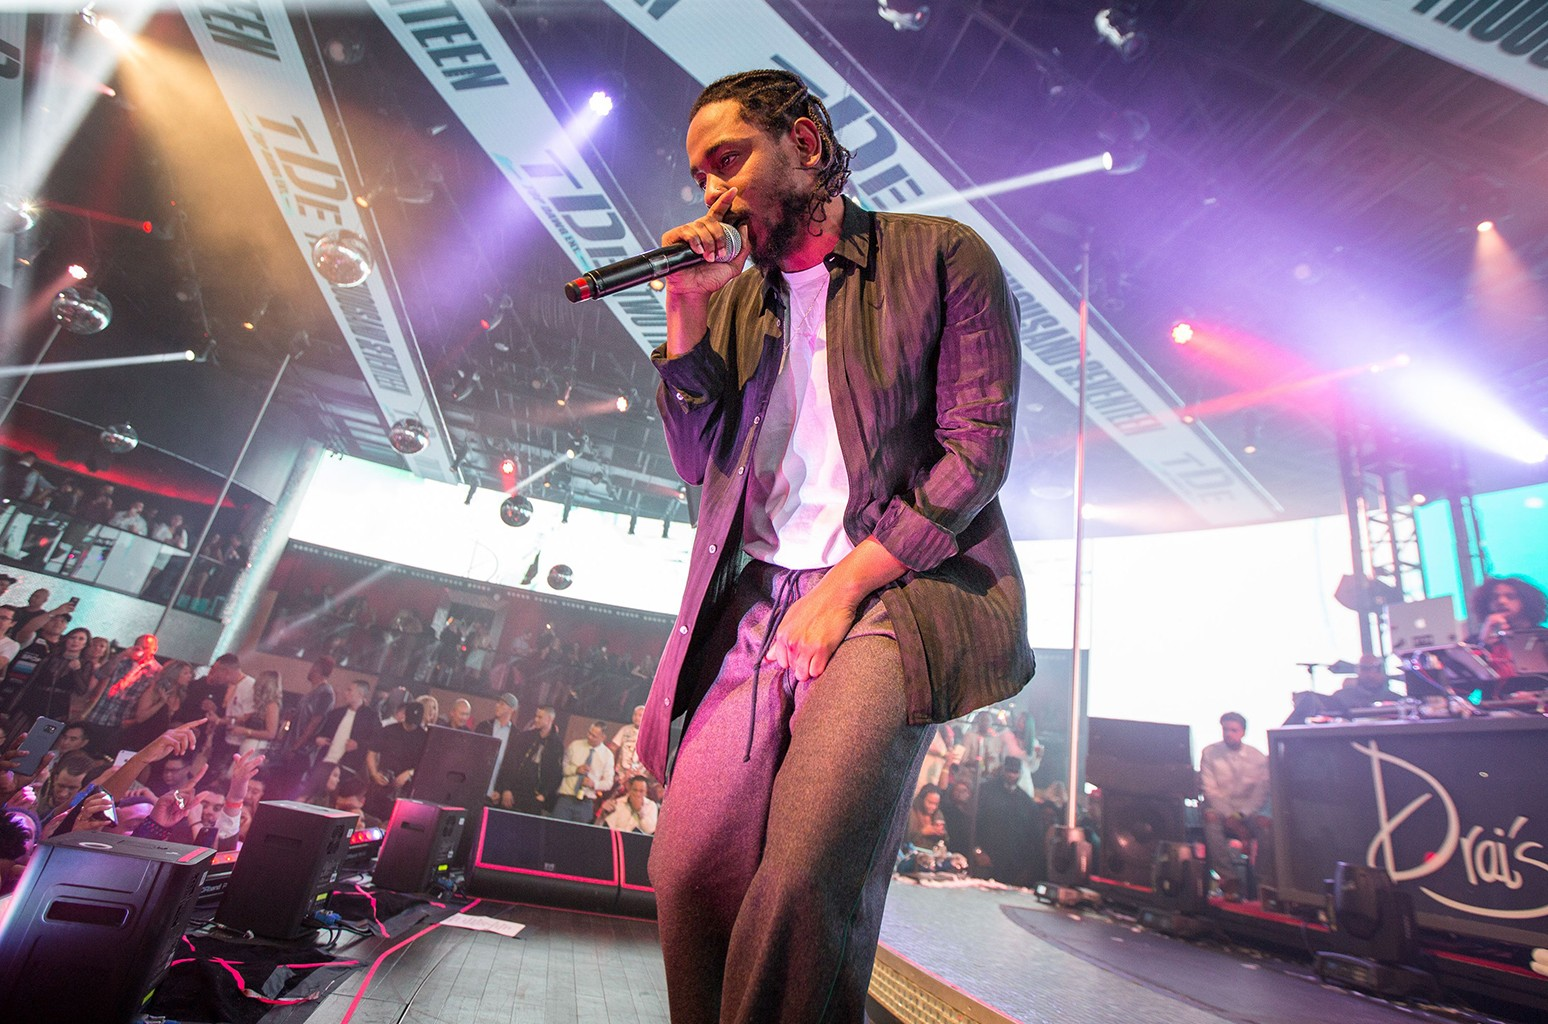 Kendrick Lamar performs at Drai's Nightclub in Las Vegas on Dec. 31, 2016.